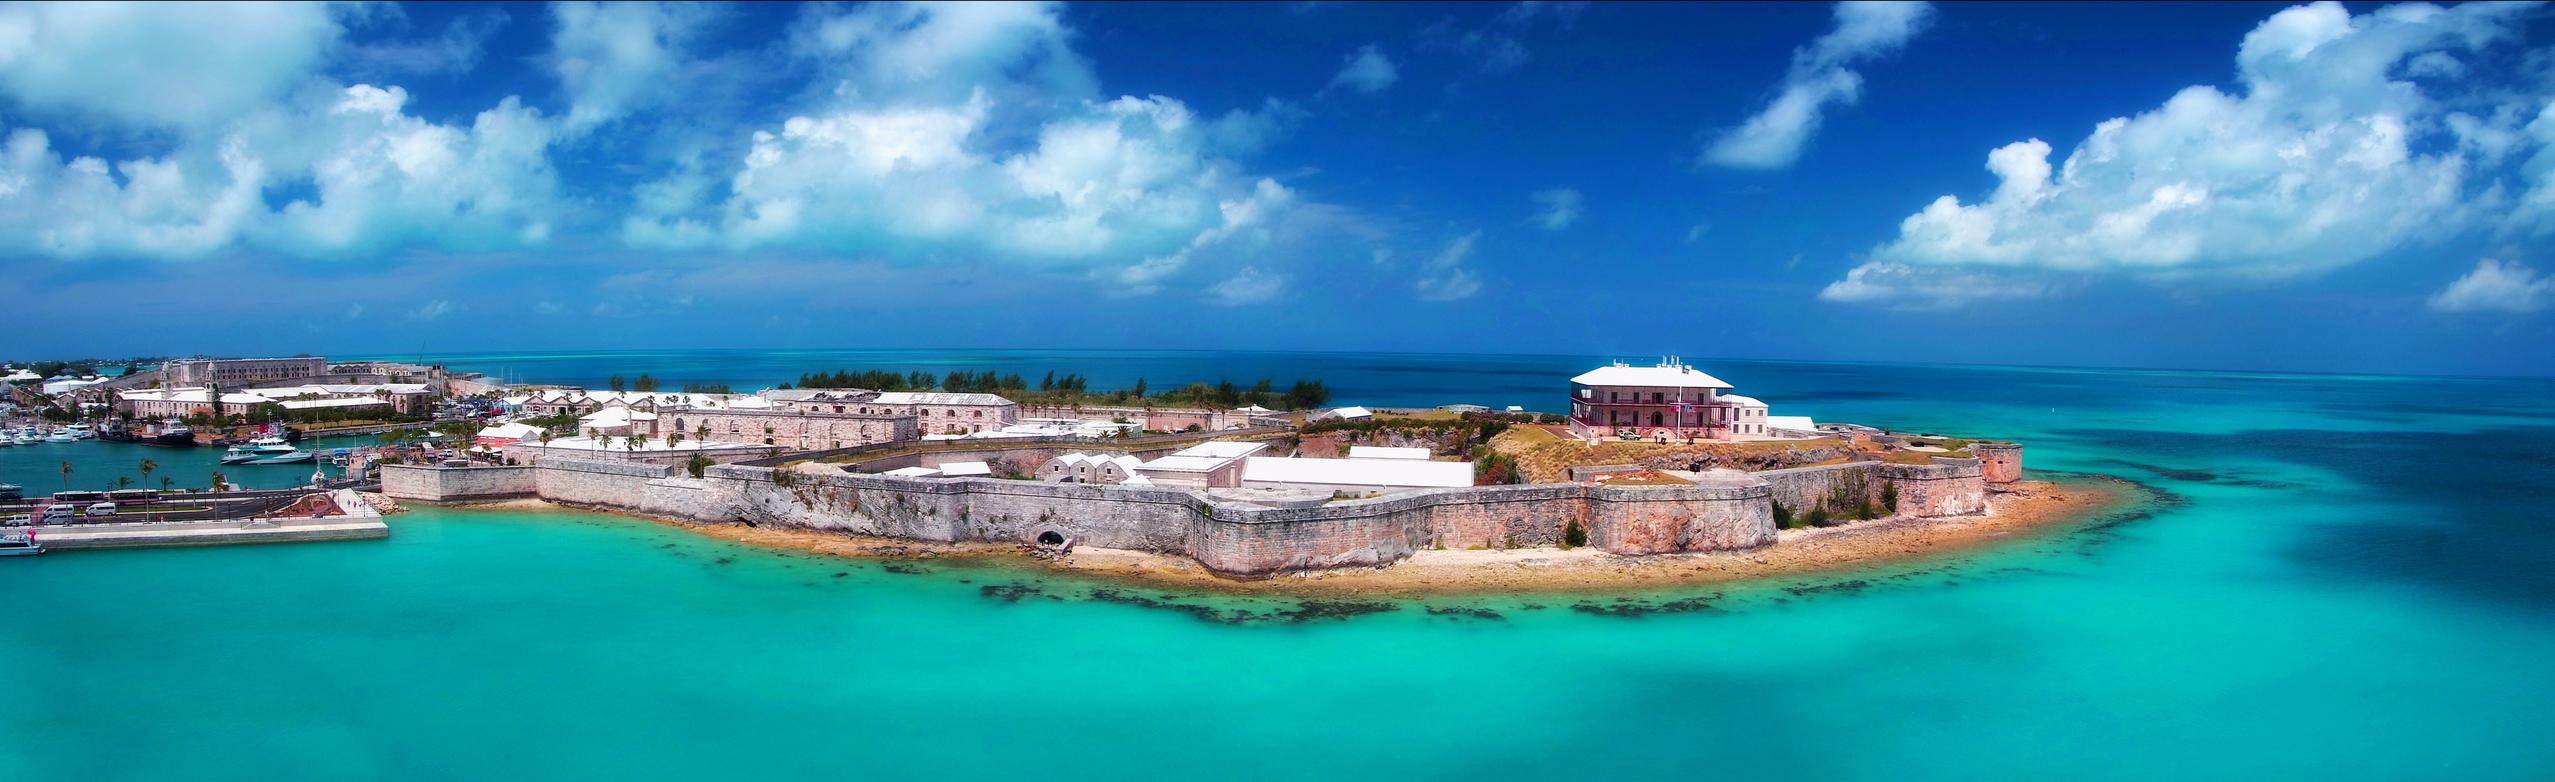 Bermuda cruise deals best cruises to bermuda - Bermuda Cruise Deals Best Cruises To Bermuda 29